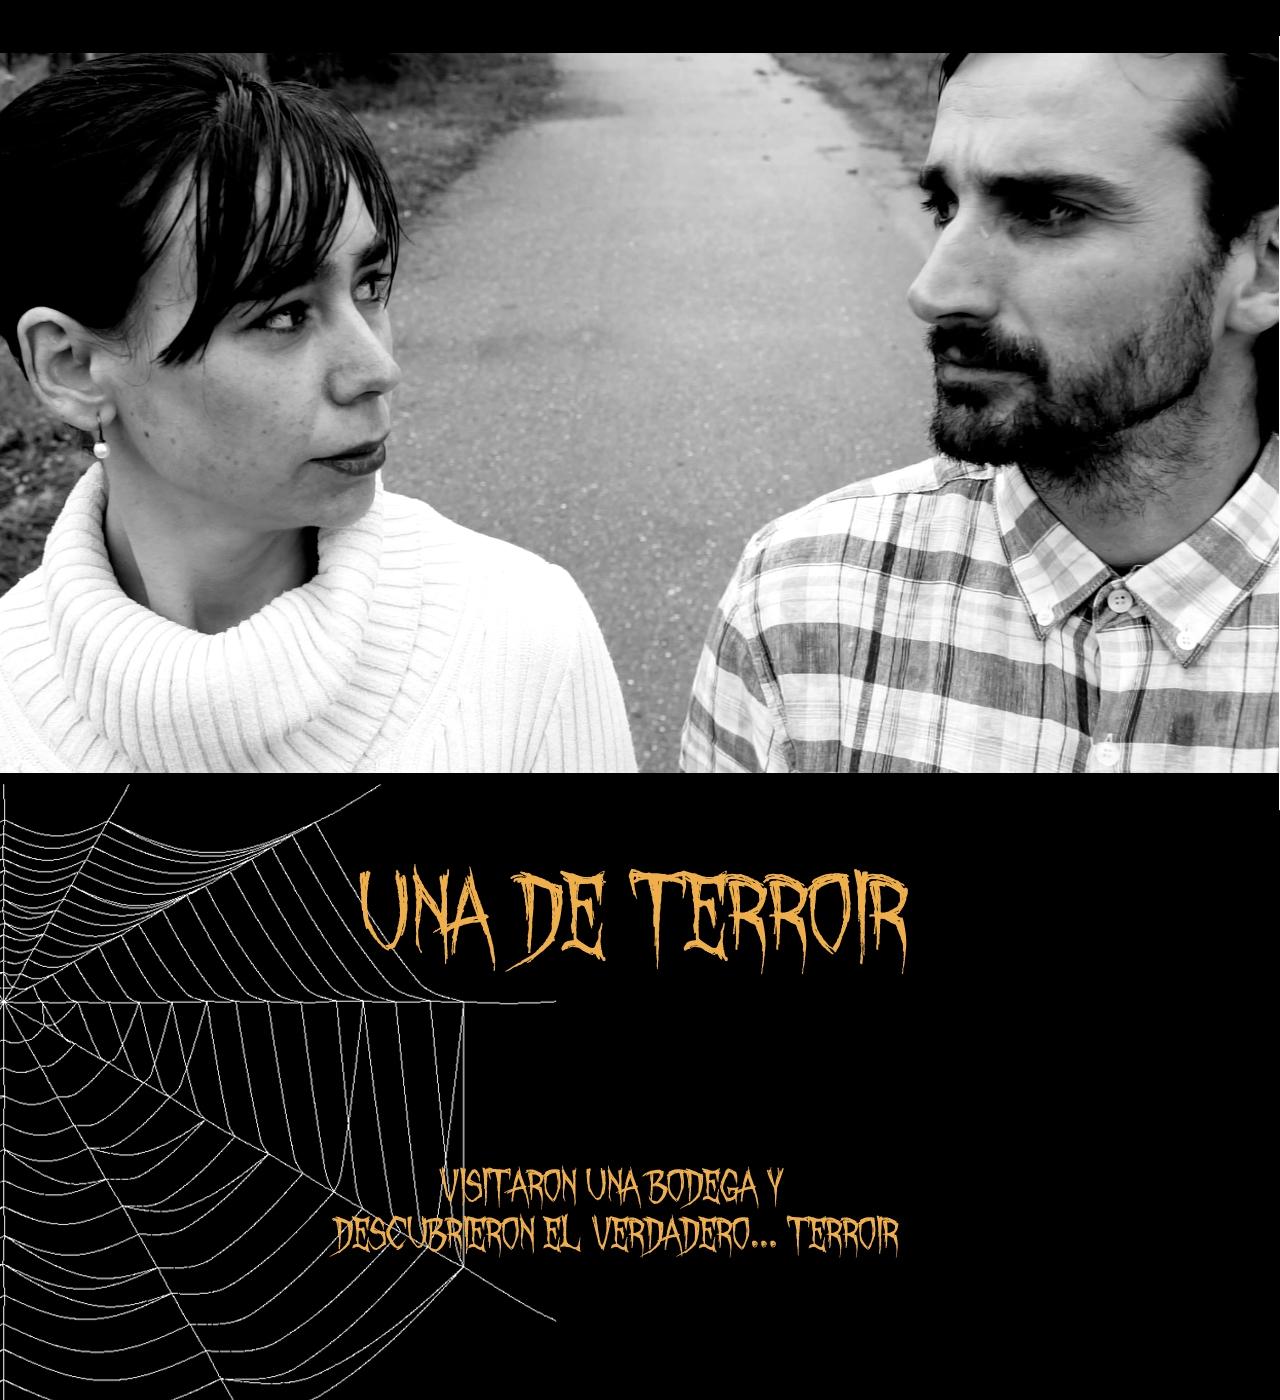 UNA DE TERROIR